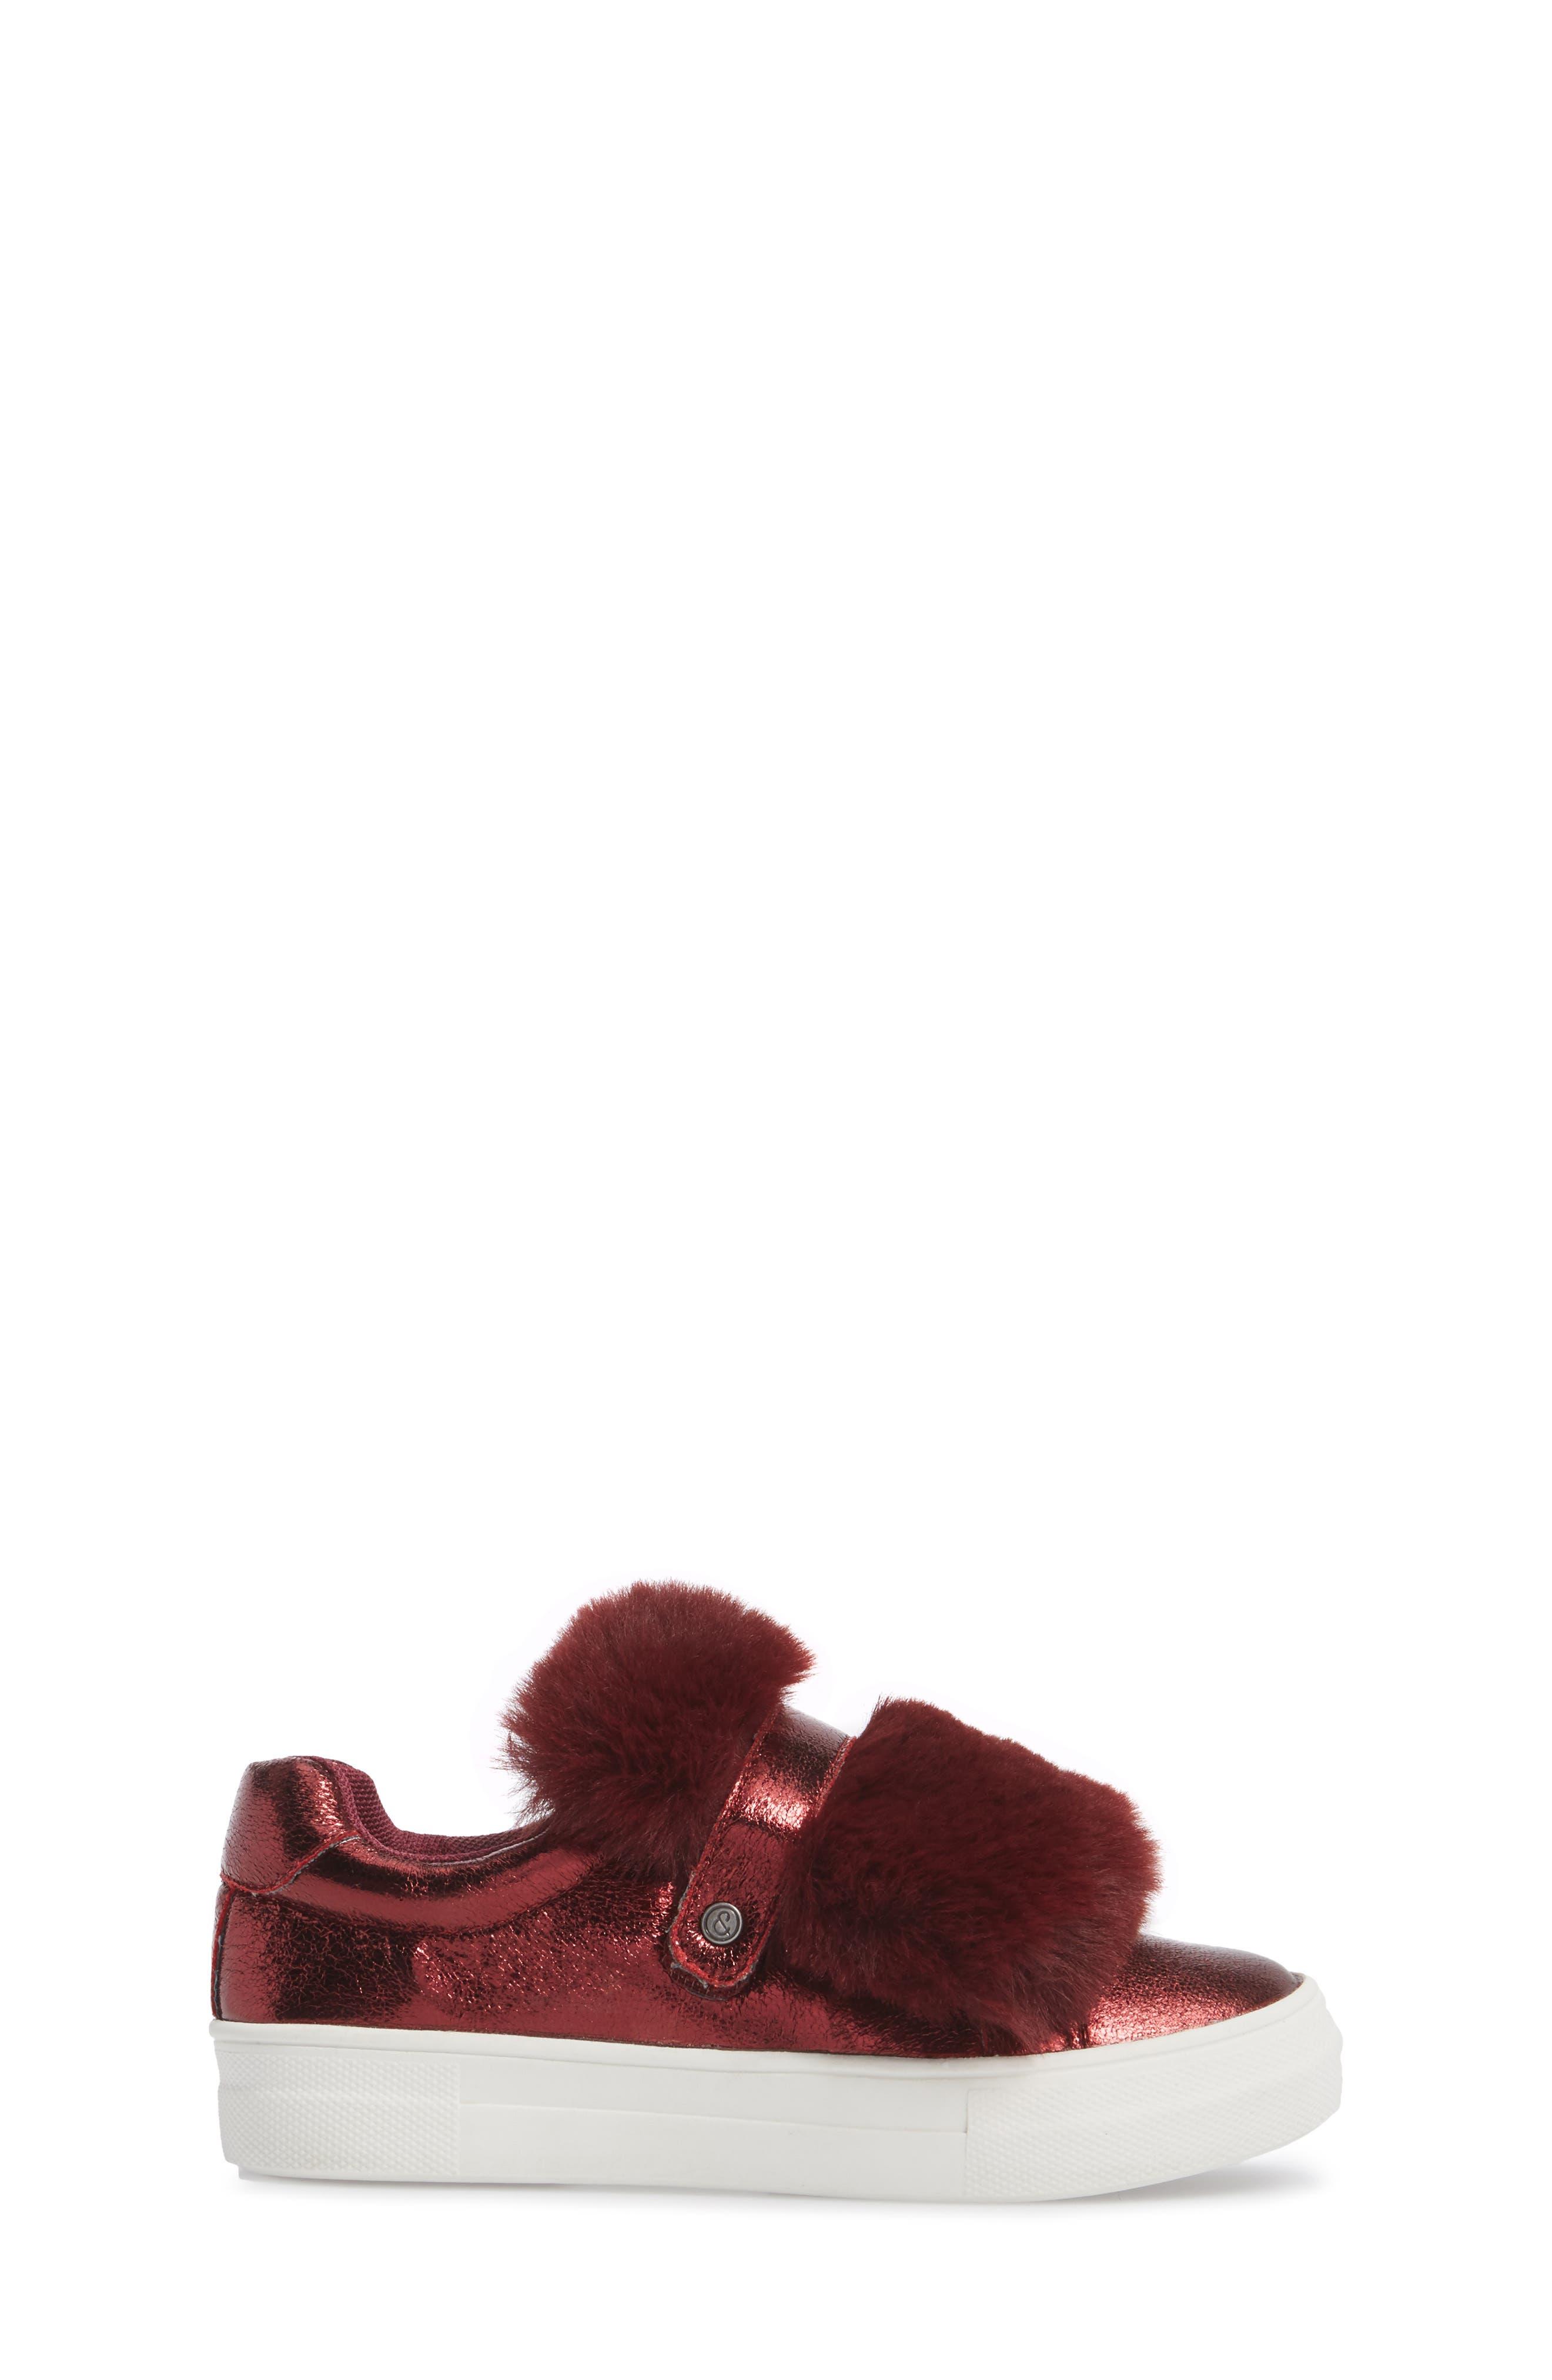 Zandra Faux Fur Metallic Sneaker,                             Alternate thumbnail 3, color,                             Burgundy Faux Leather